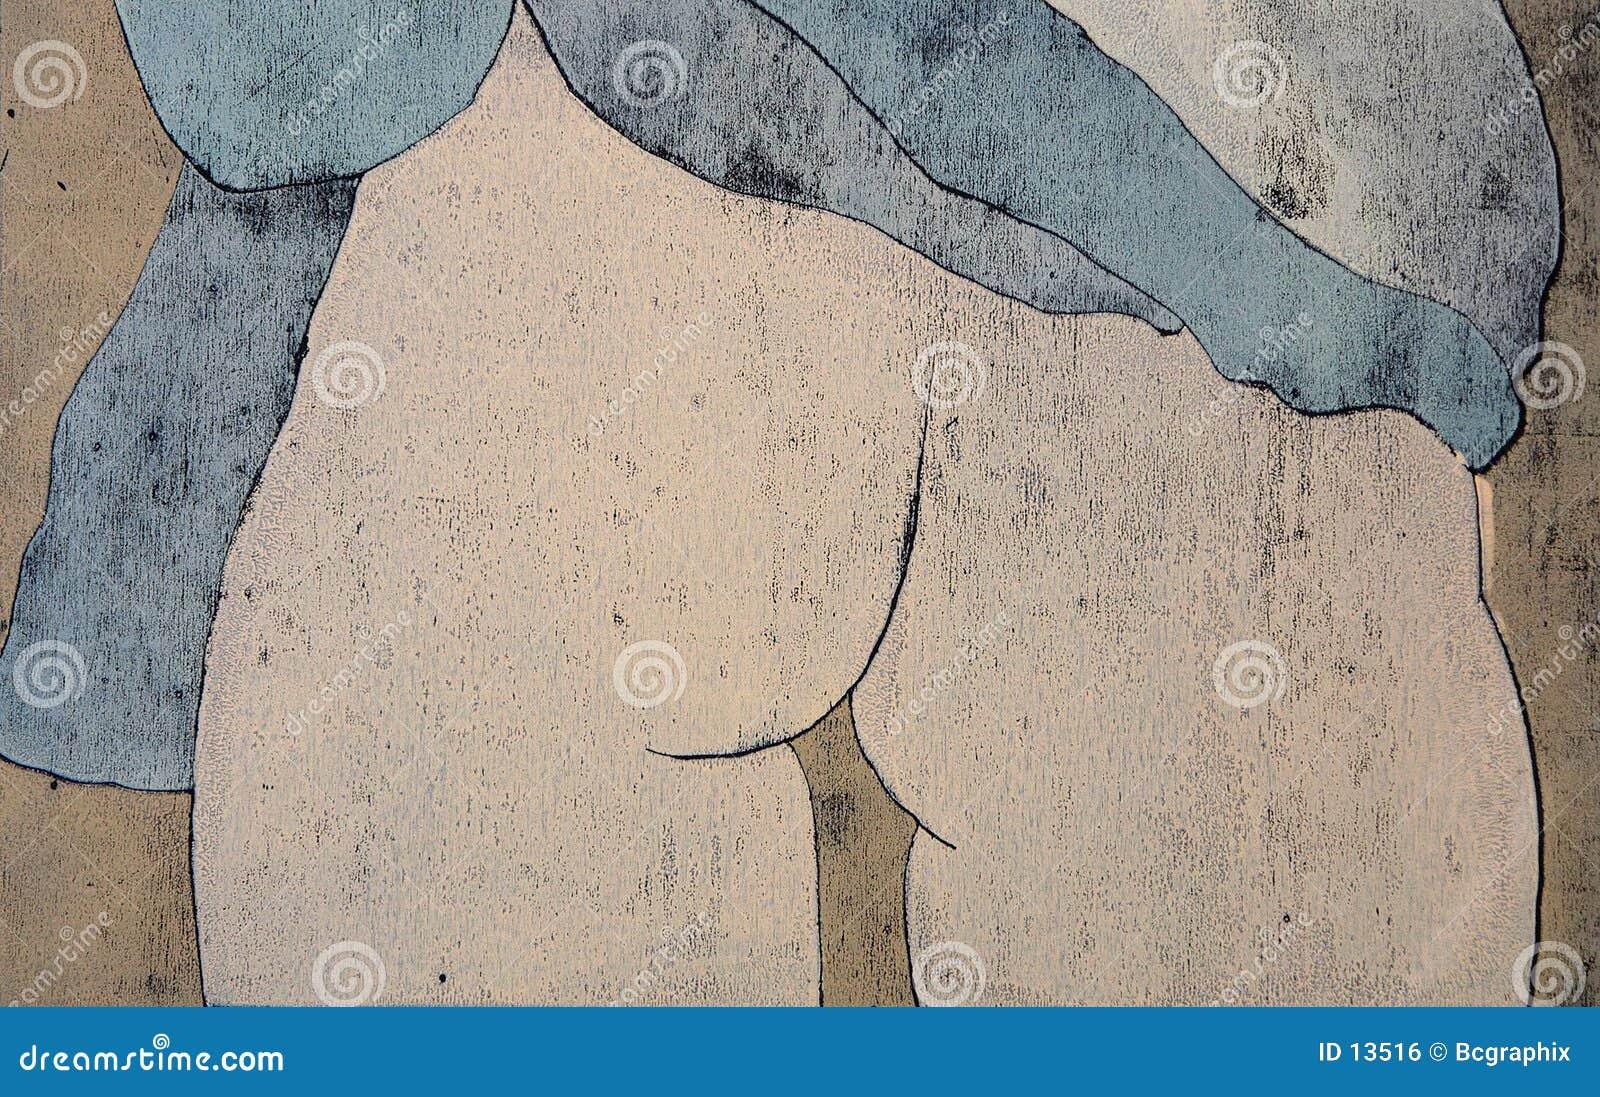 Women s behind undressing